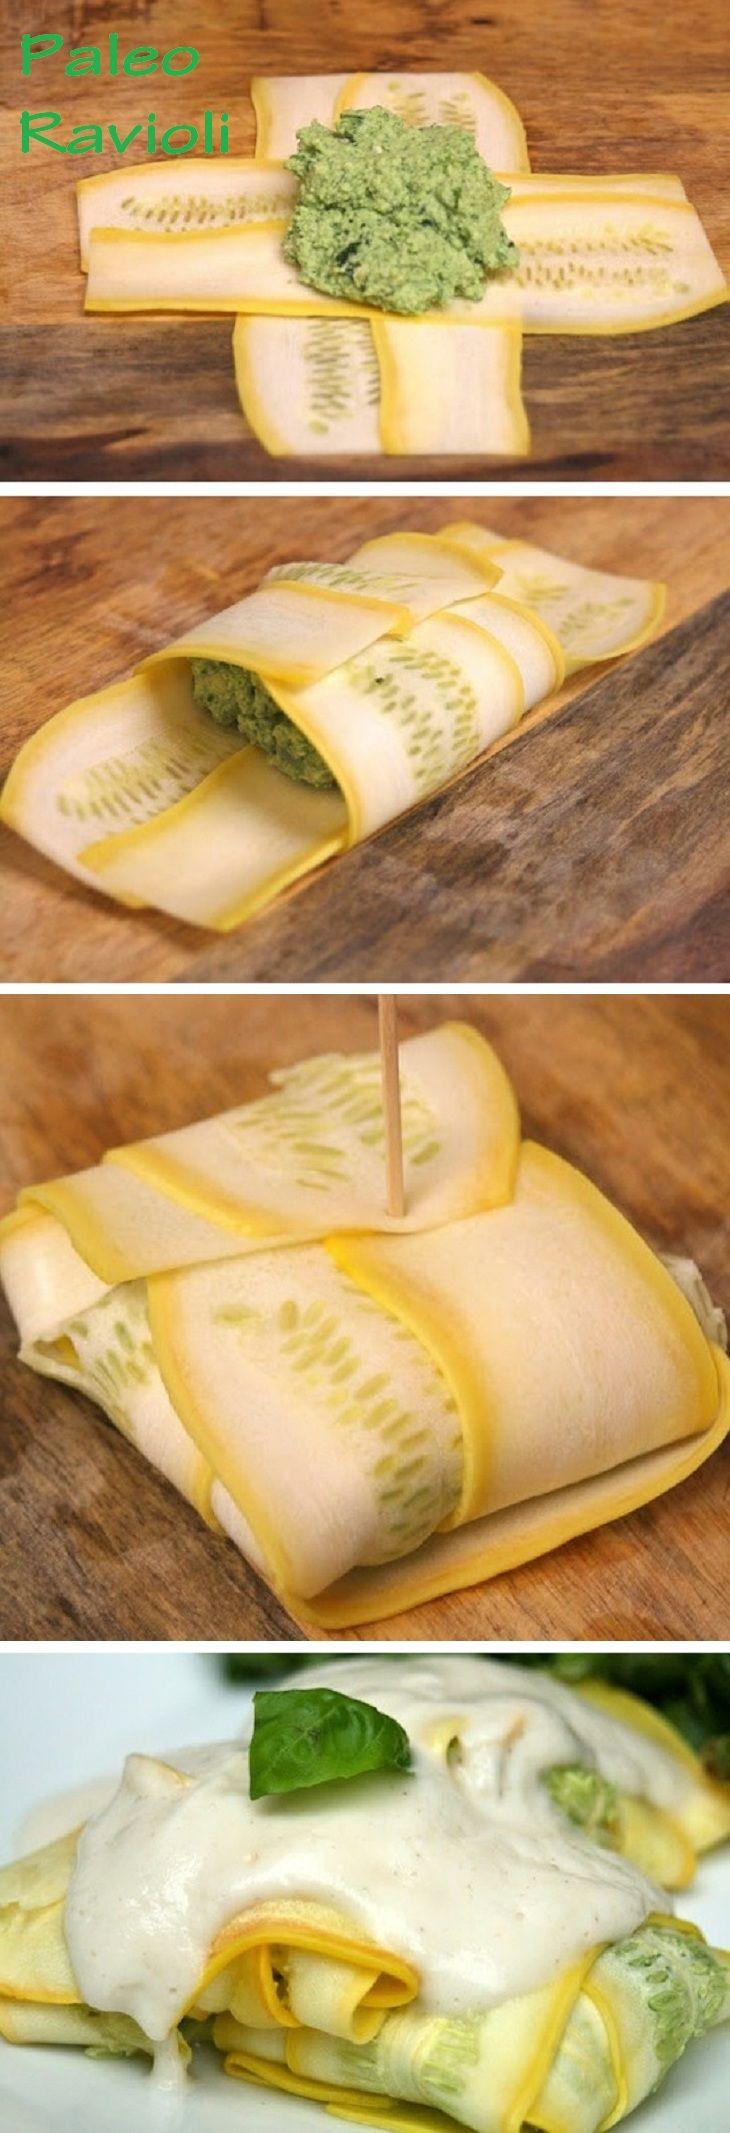 Healthy Eating - Paleo Ravioli - Cupcakepedia